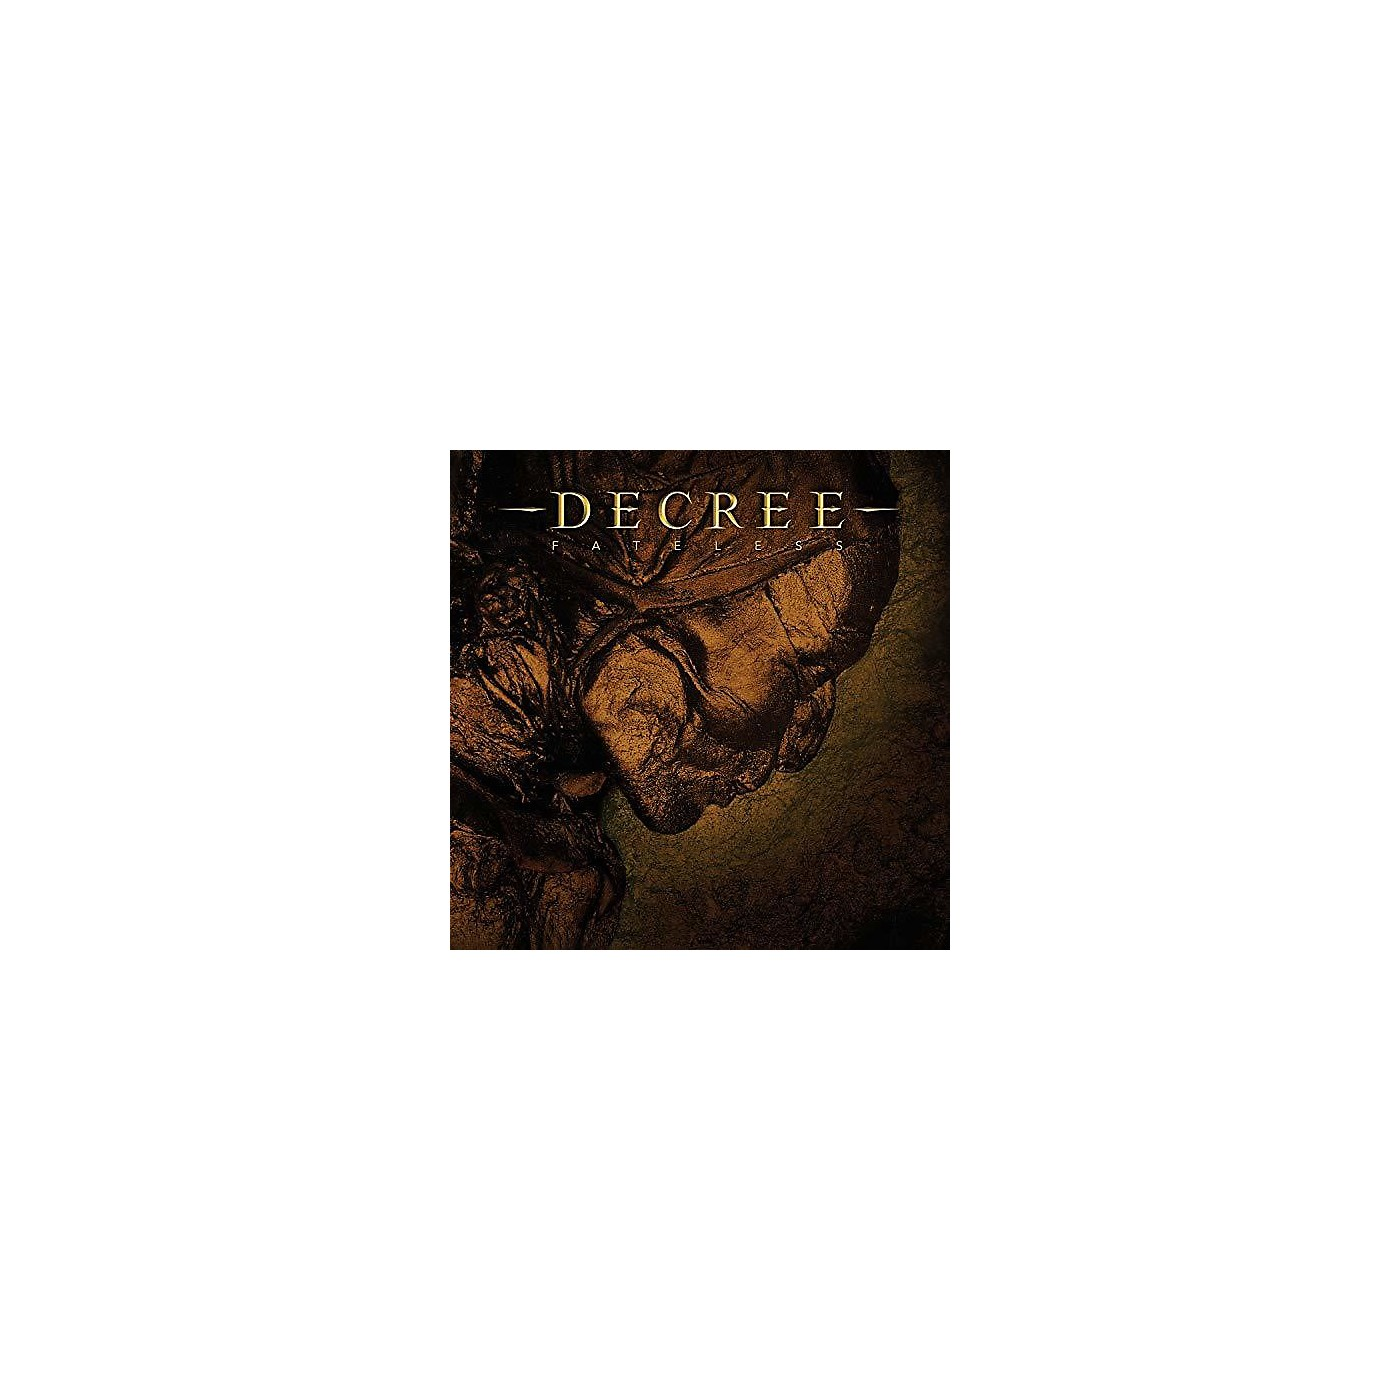 Alliance Decree - Fateless thumbnail